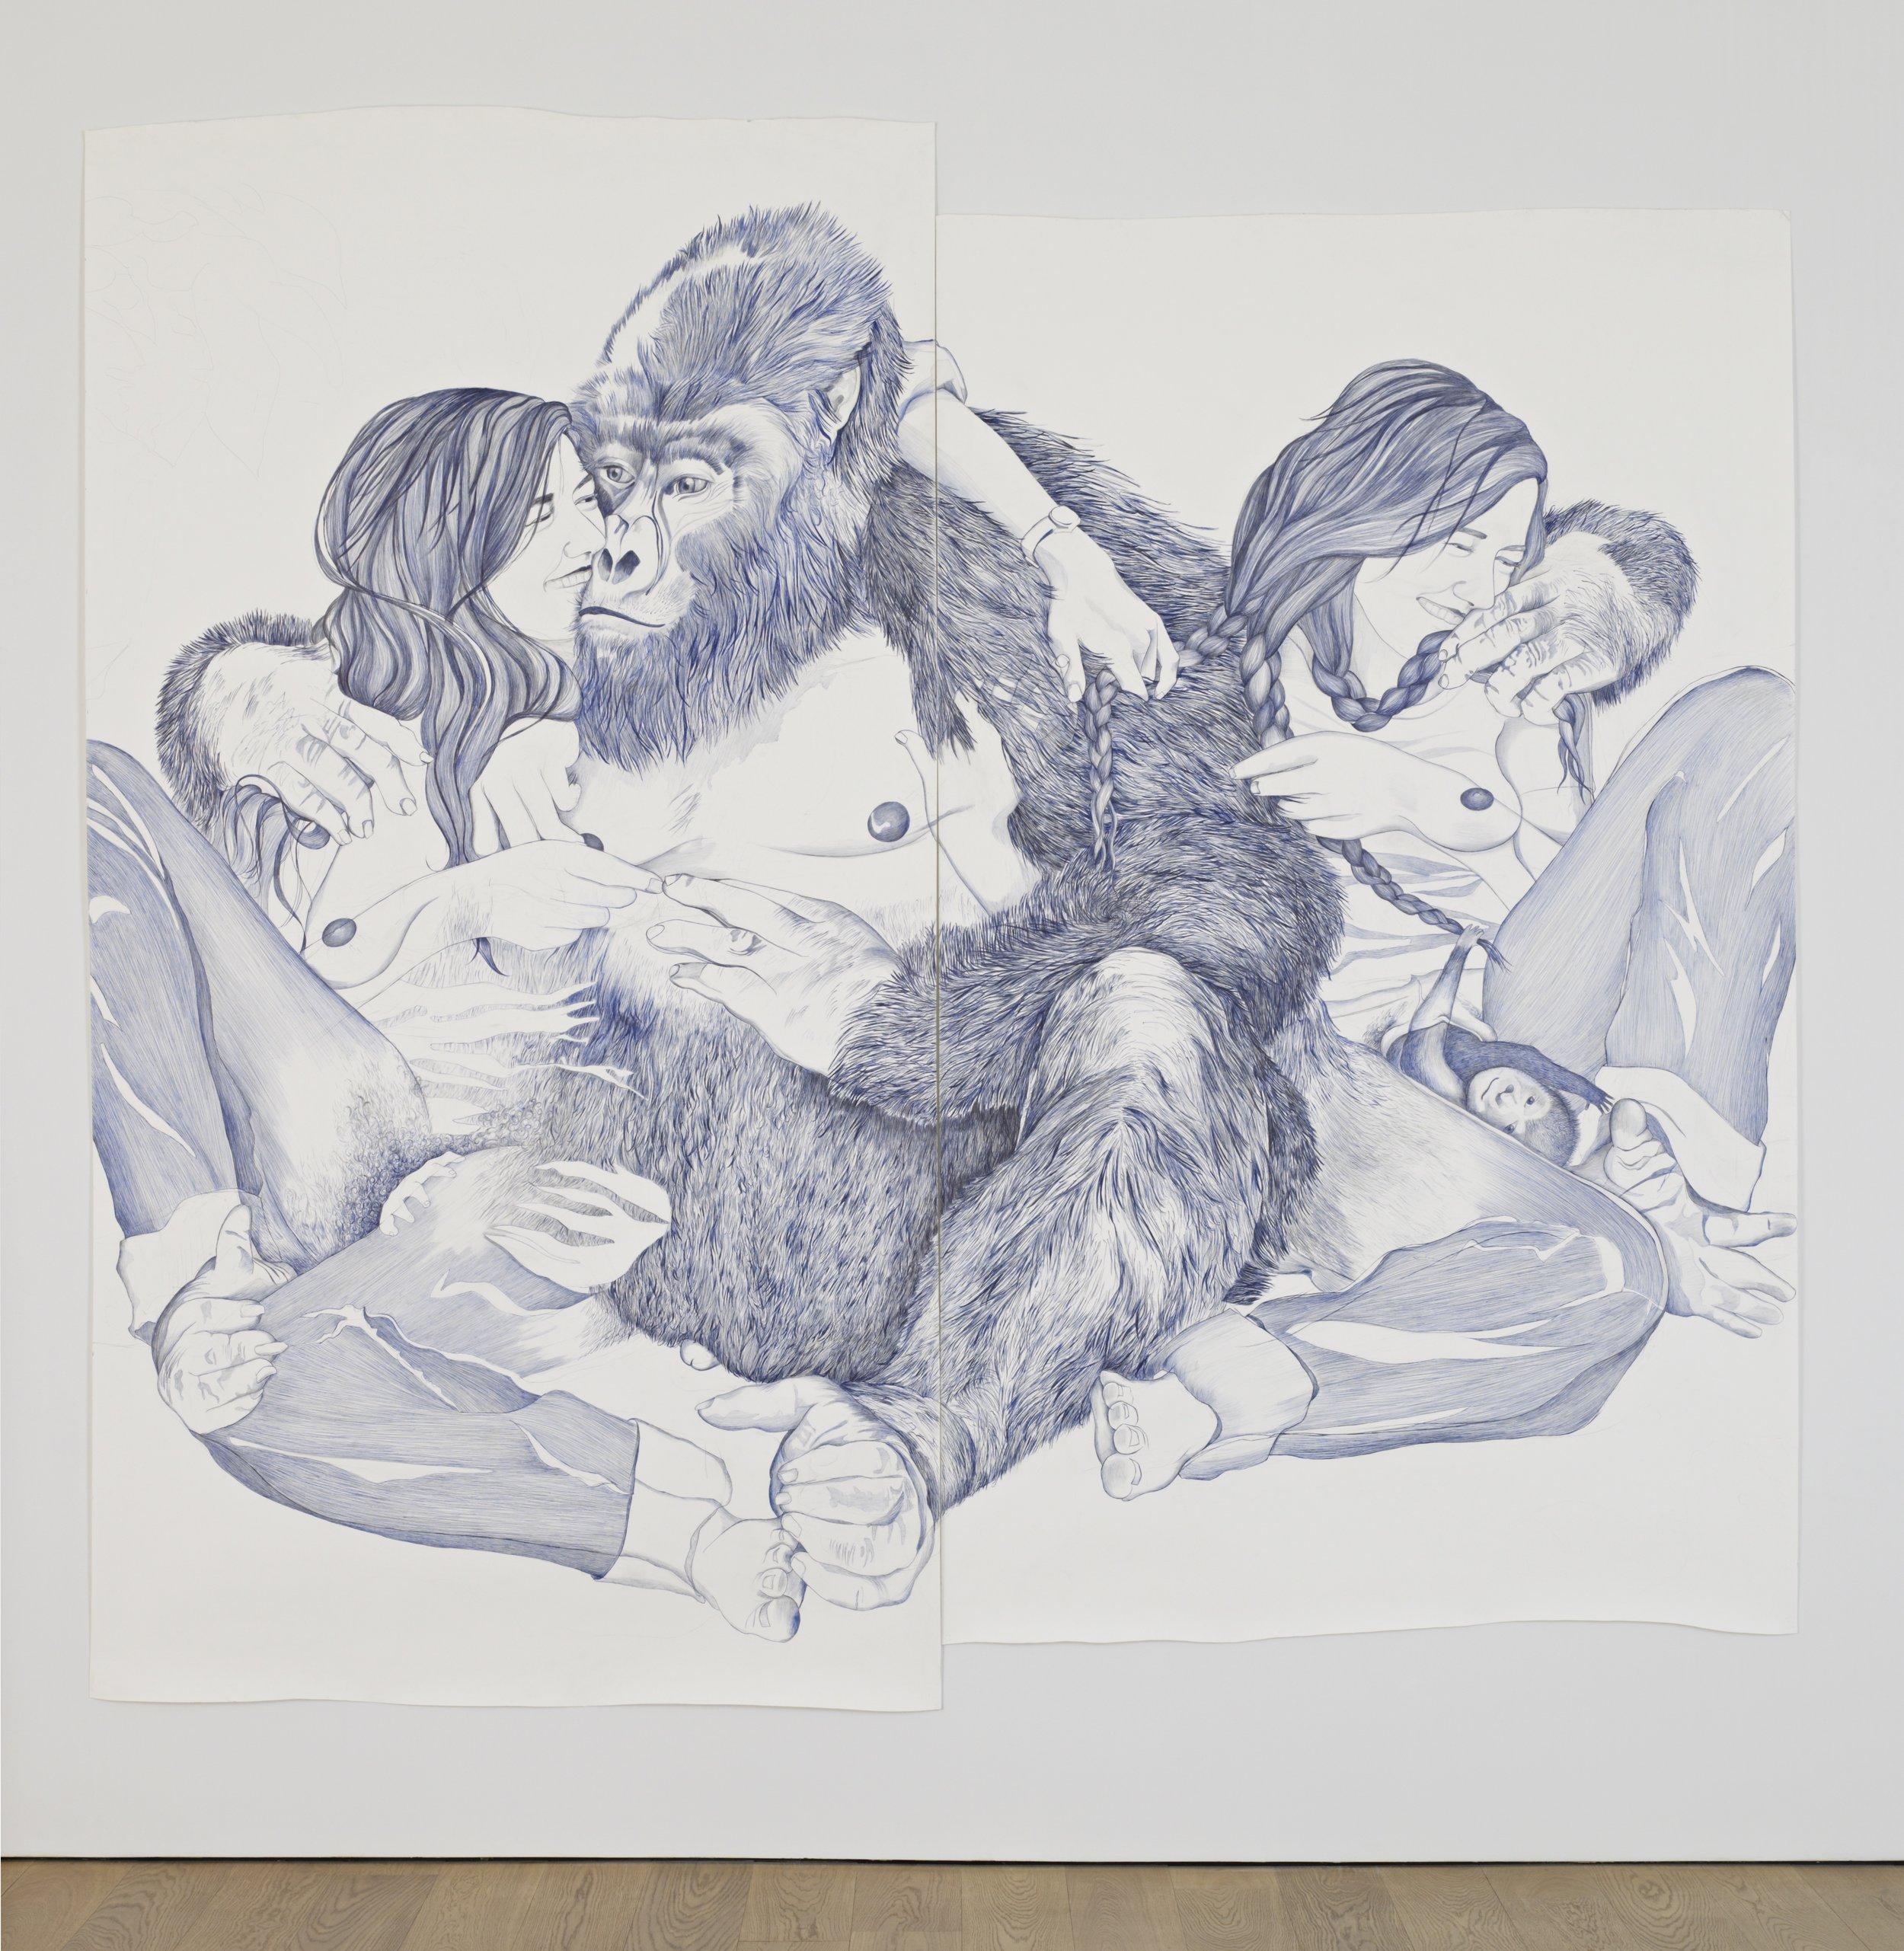 MARLENE MCCARTY  (1957) GROUP 8 (Karisoke, The Virungas, Rwanda. September 24, 1967. 4:30pm.), 2006, bolígrafo y grafito sobre papel,285.8 x 304.8,© Marlene McCarty, cortesía de Sikkema Jenkins & Co., New York.